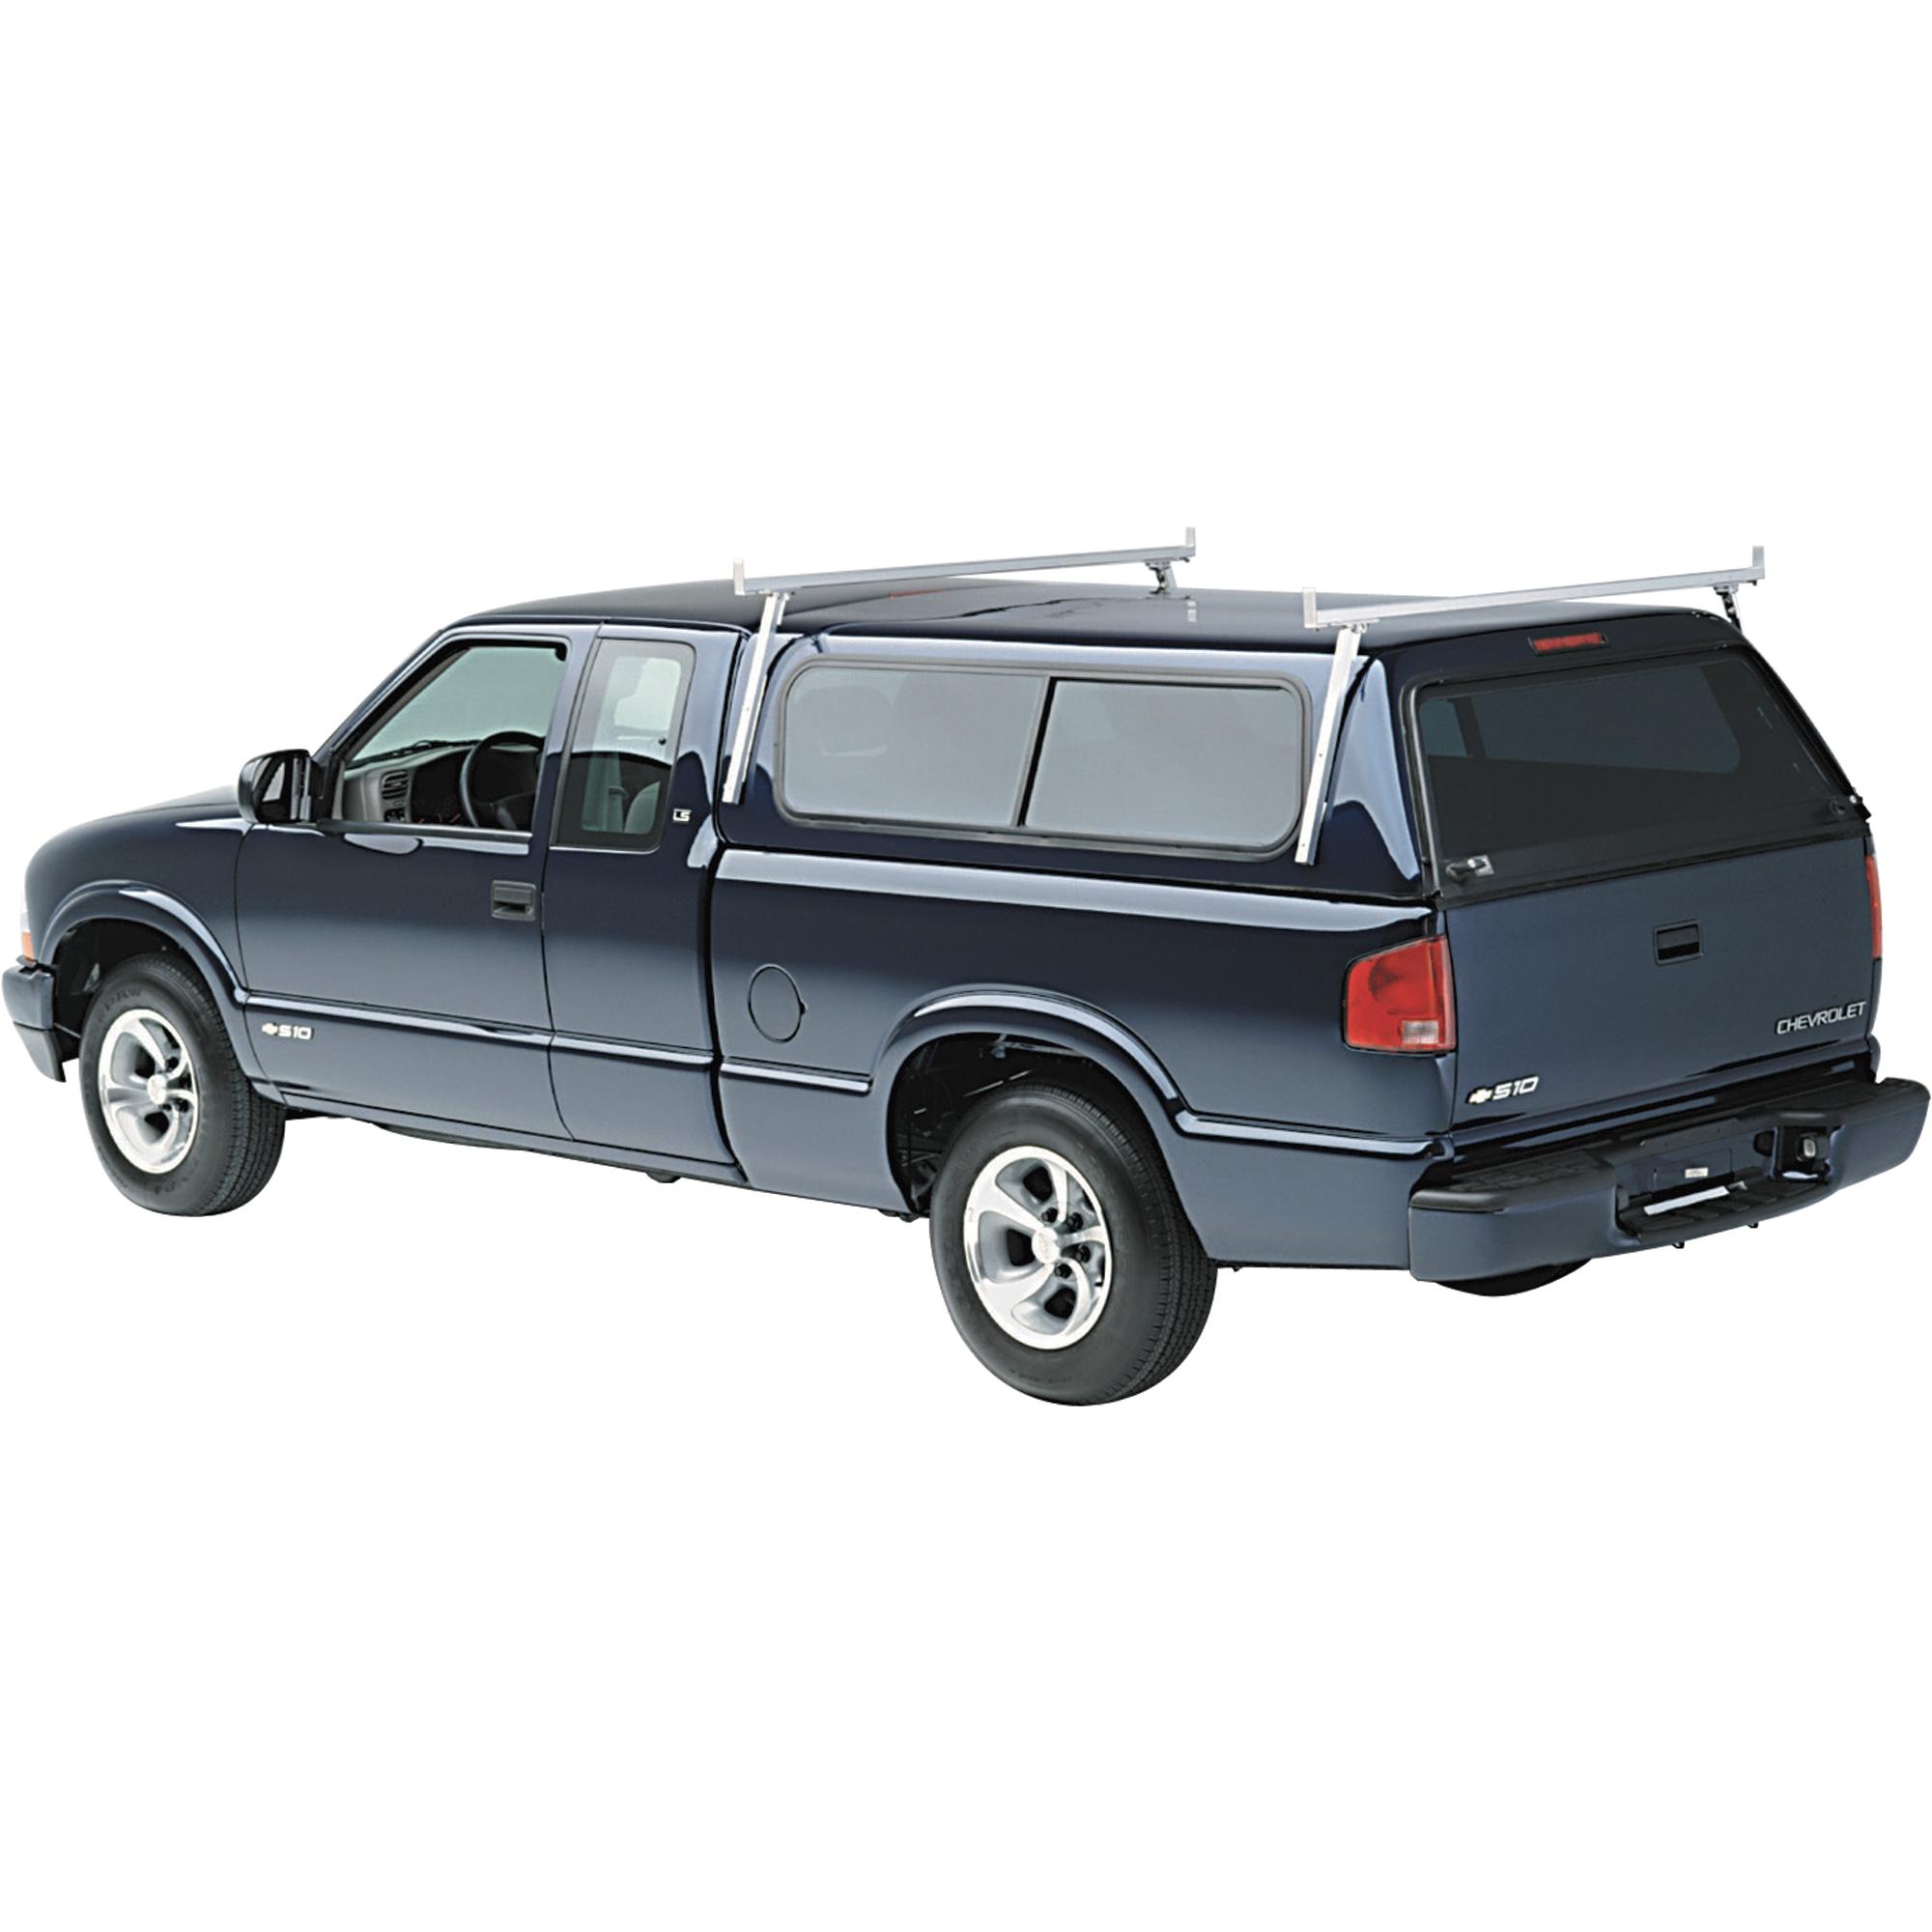 advantage exclusive hauler racks universal aluminum camper shell rack for full size pickup trucks with caps